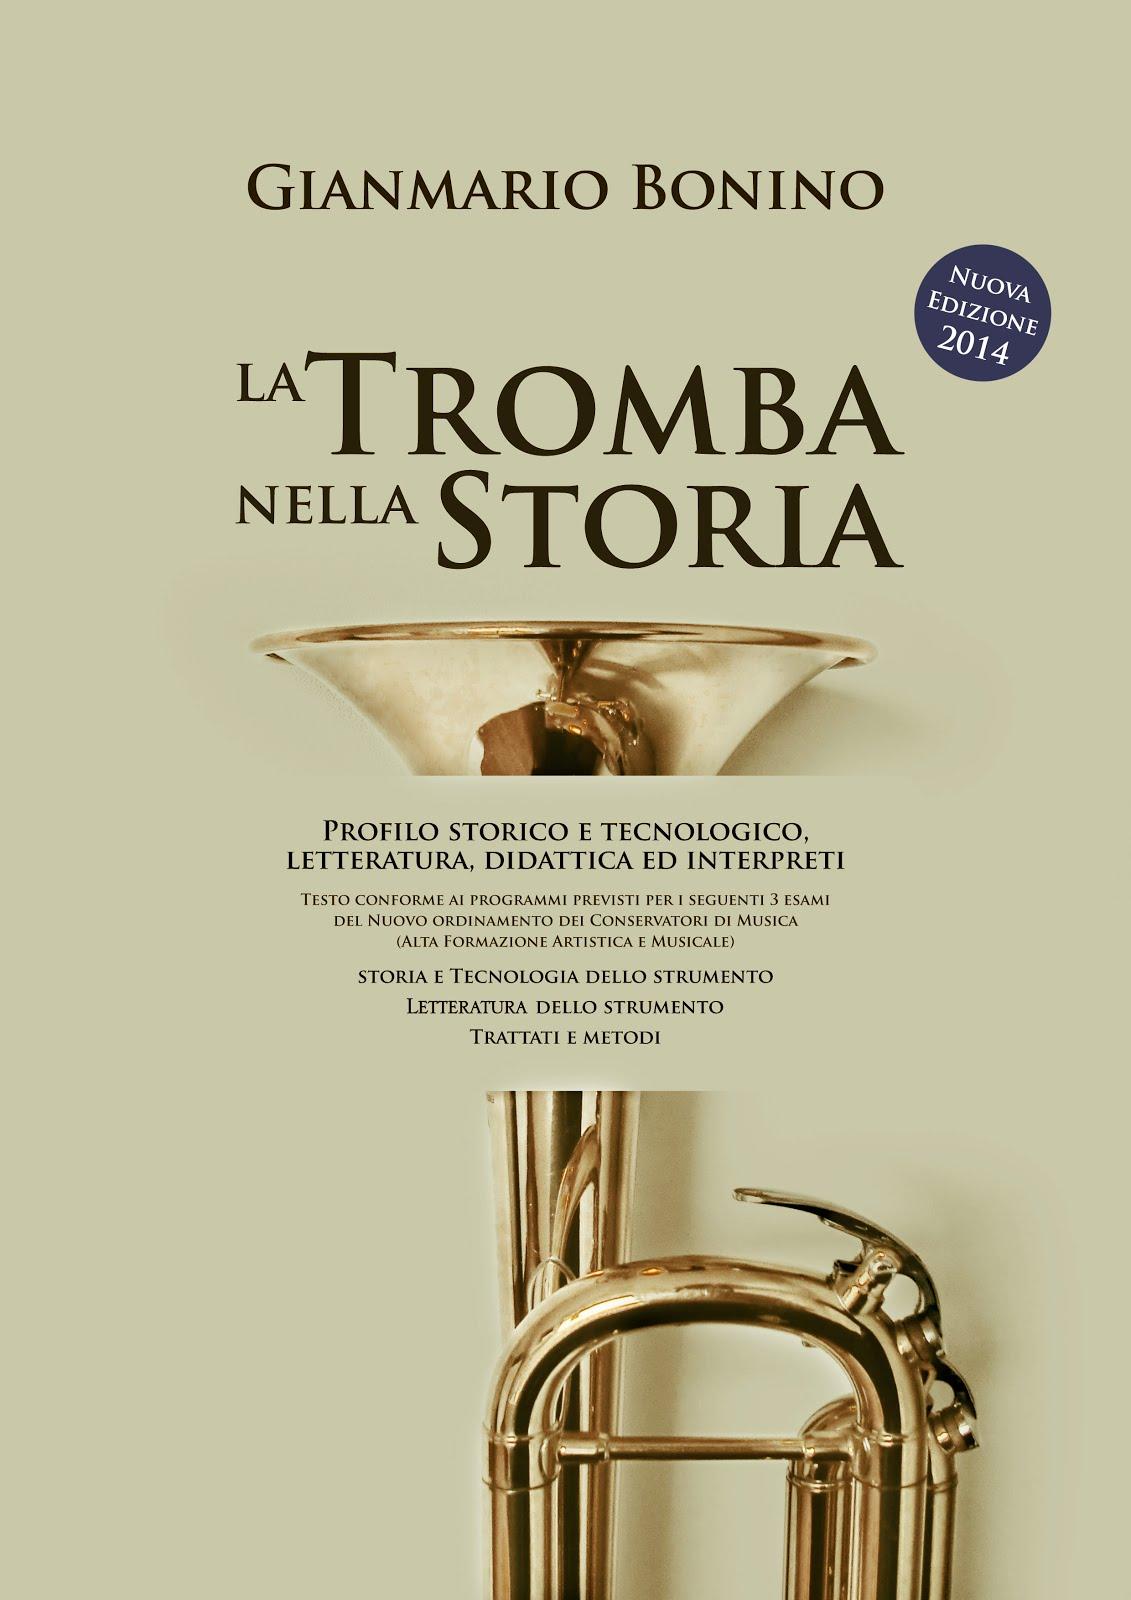 Libri di Gianmario Bonino